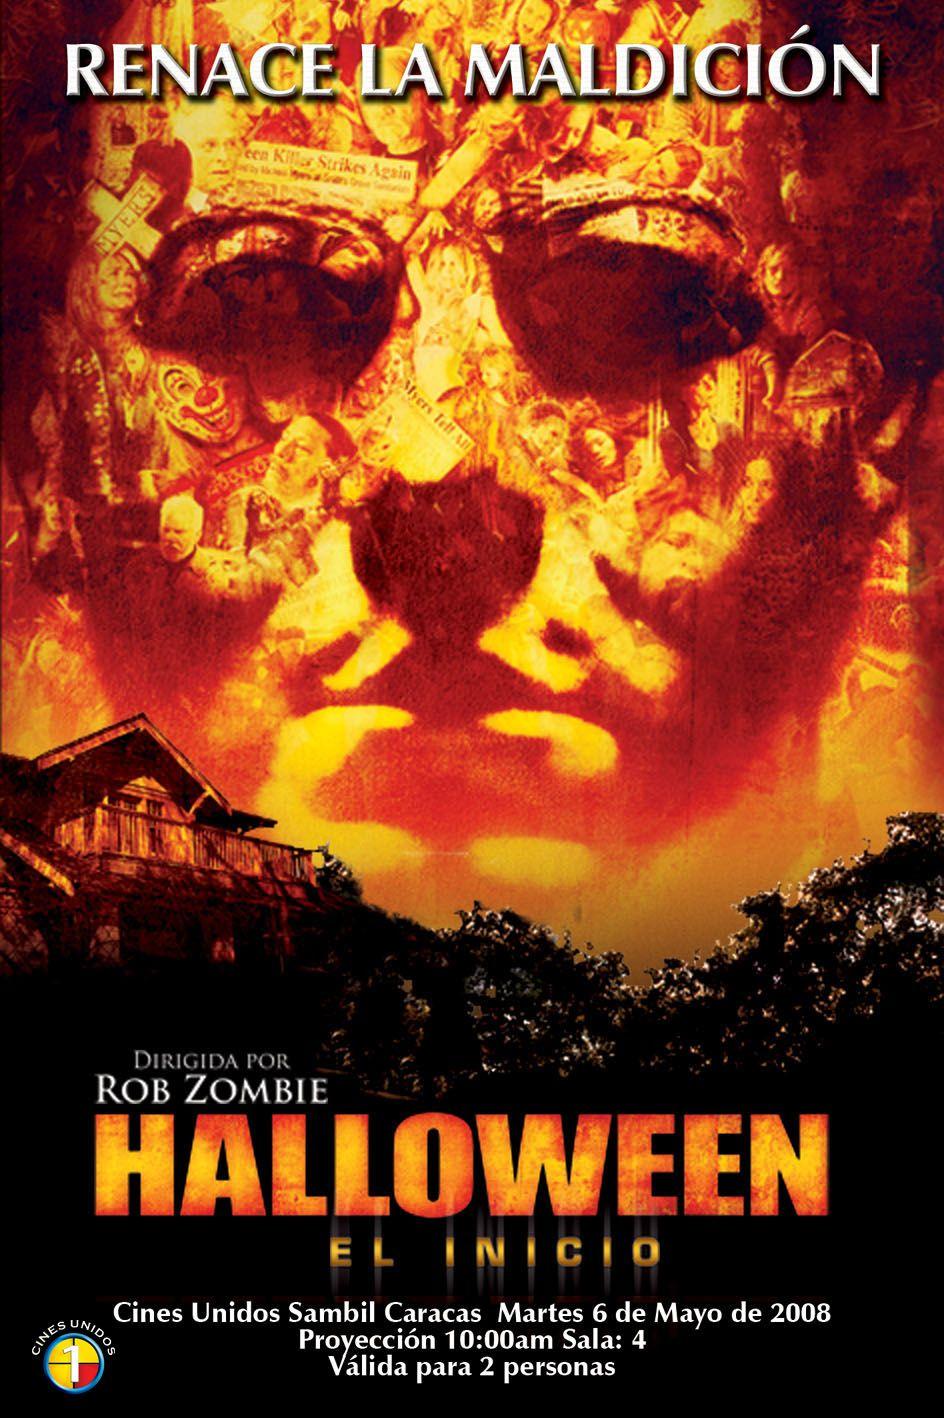 Halloween El Comienzo Movie Posters Movies Poster